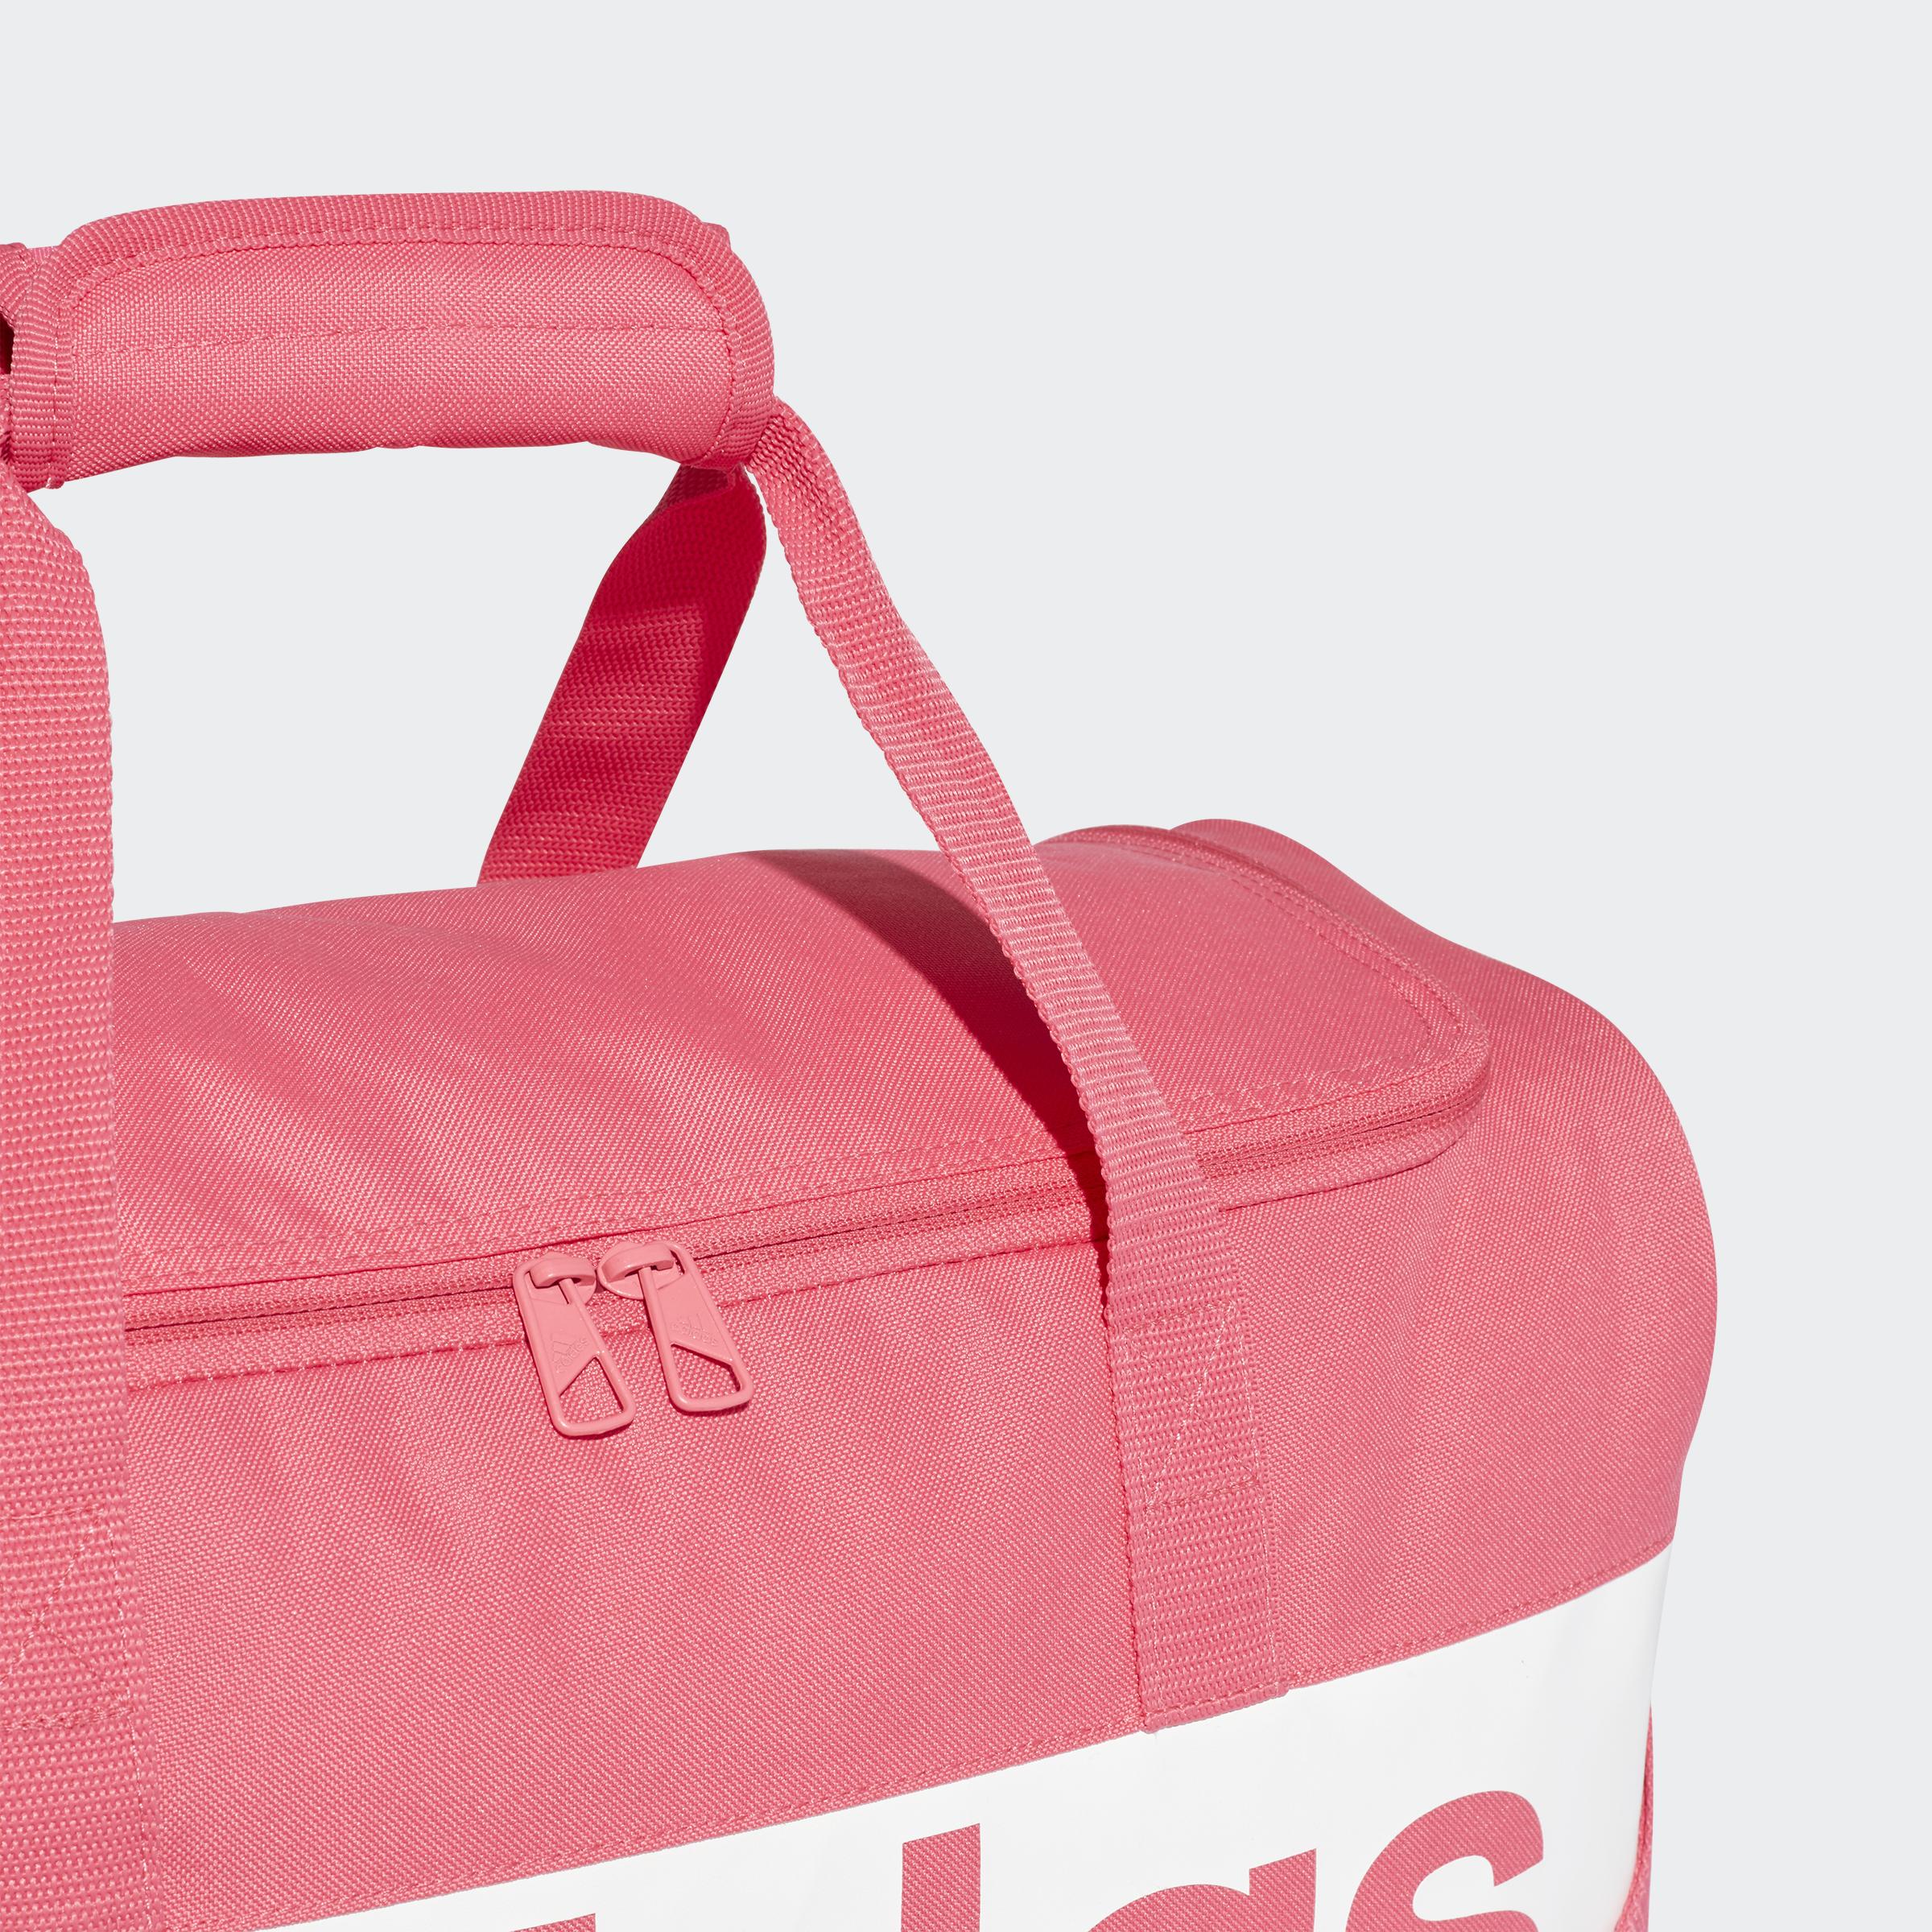 df7c76f9b90a85 Adidas Linear Performance Duffel Bag Small at £21.95 | love the brands